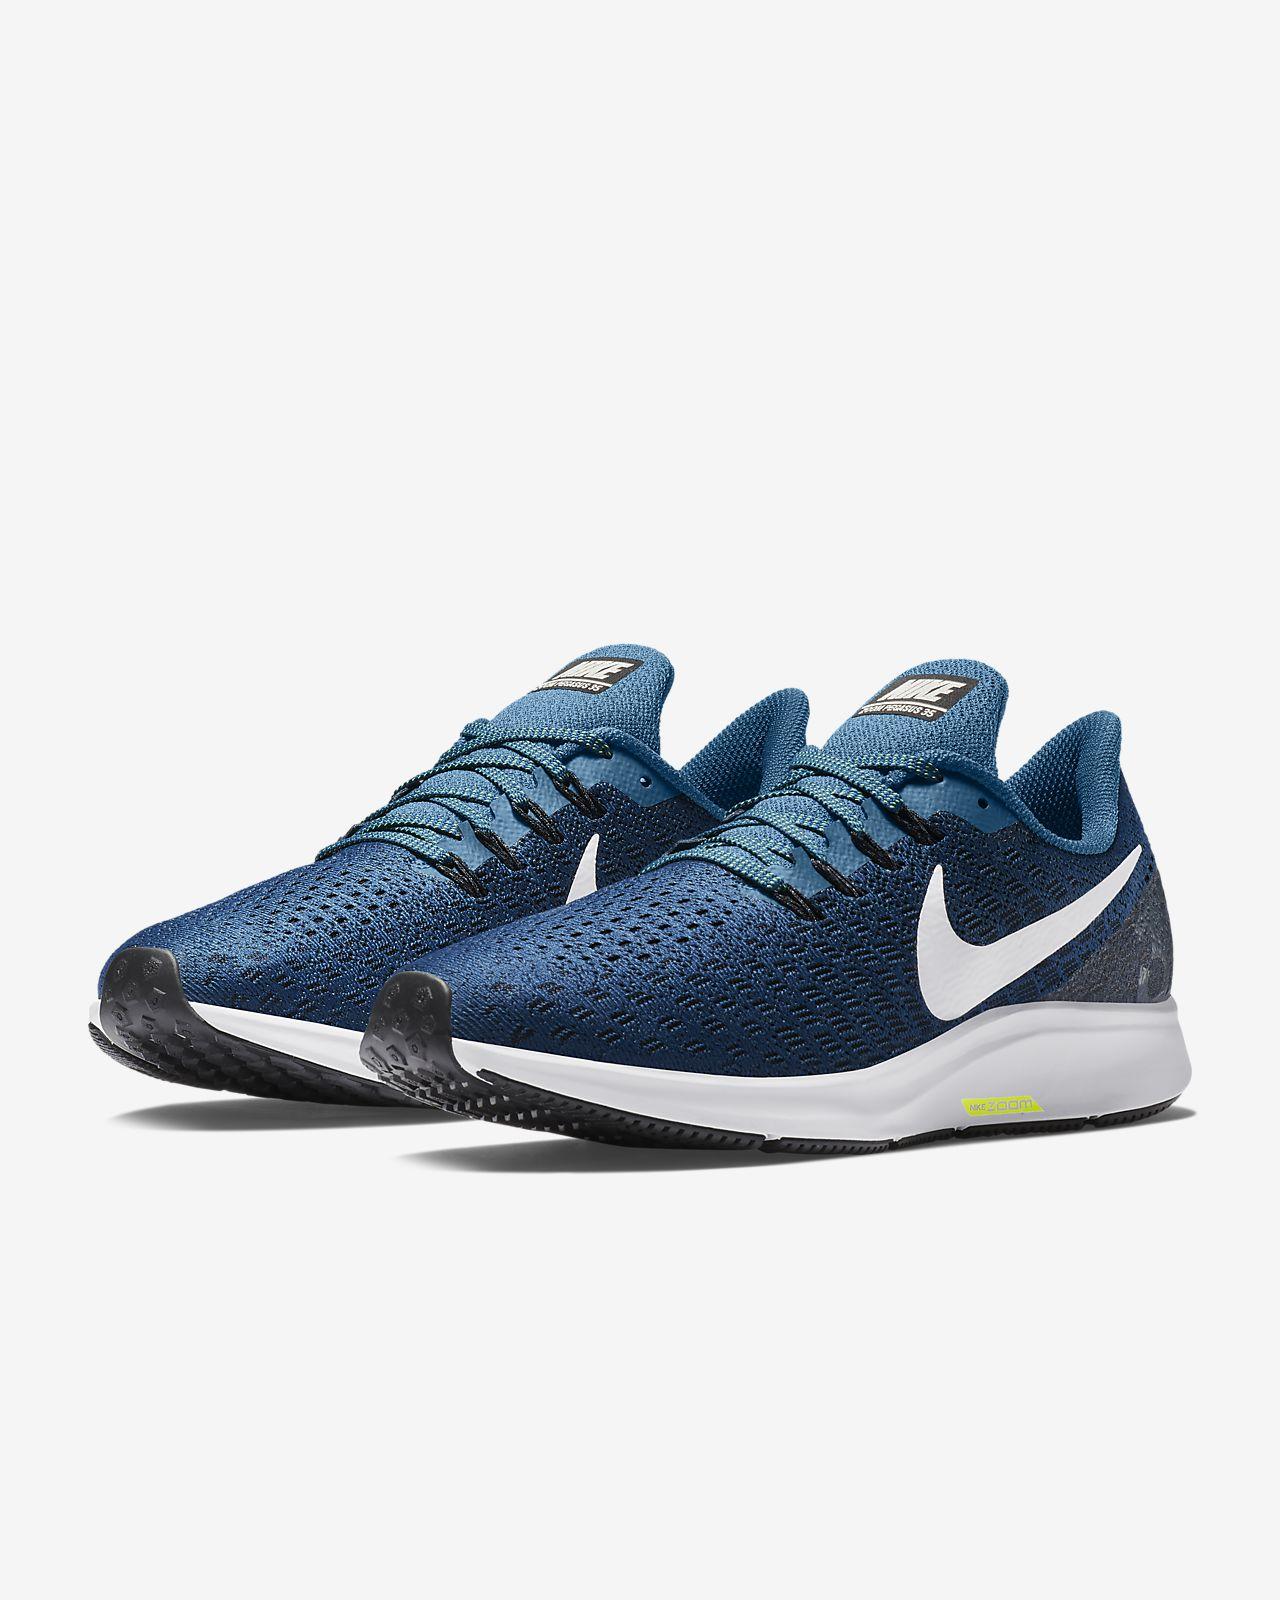 promo code 57e1f 749e6 ... Chaussure de running Nike Air Zoom Pegasus 35 pour Homme